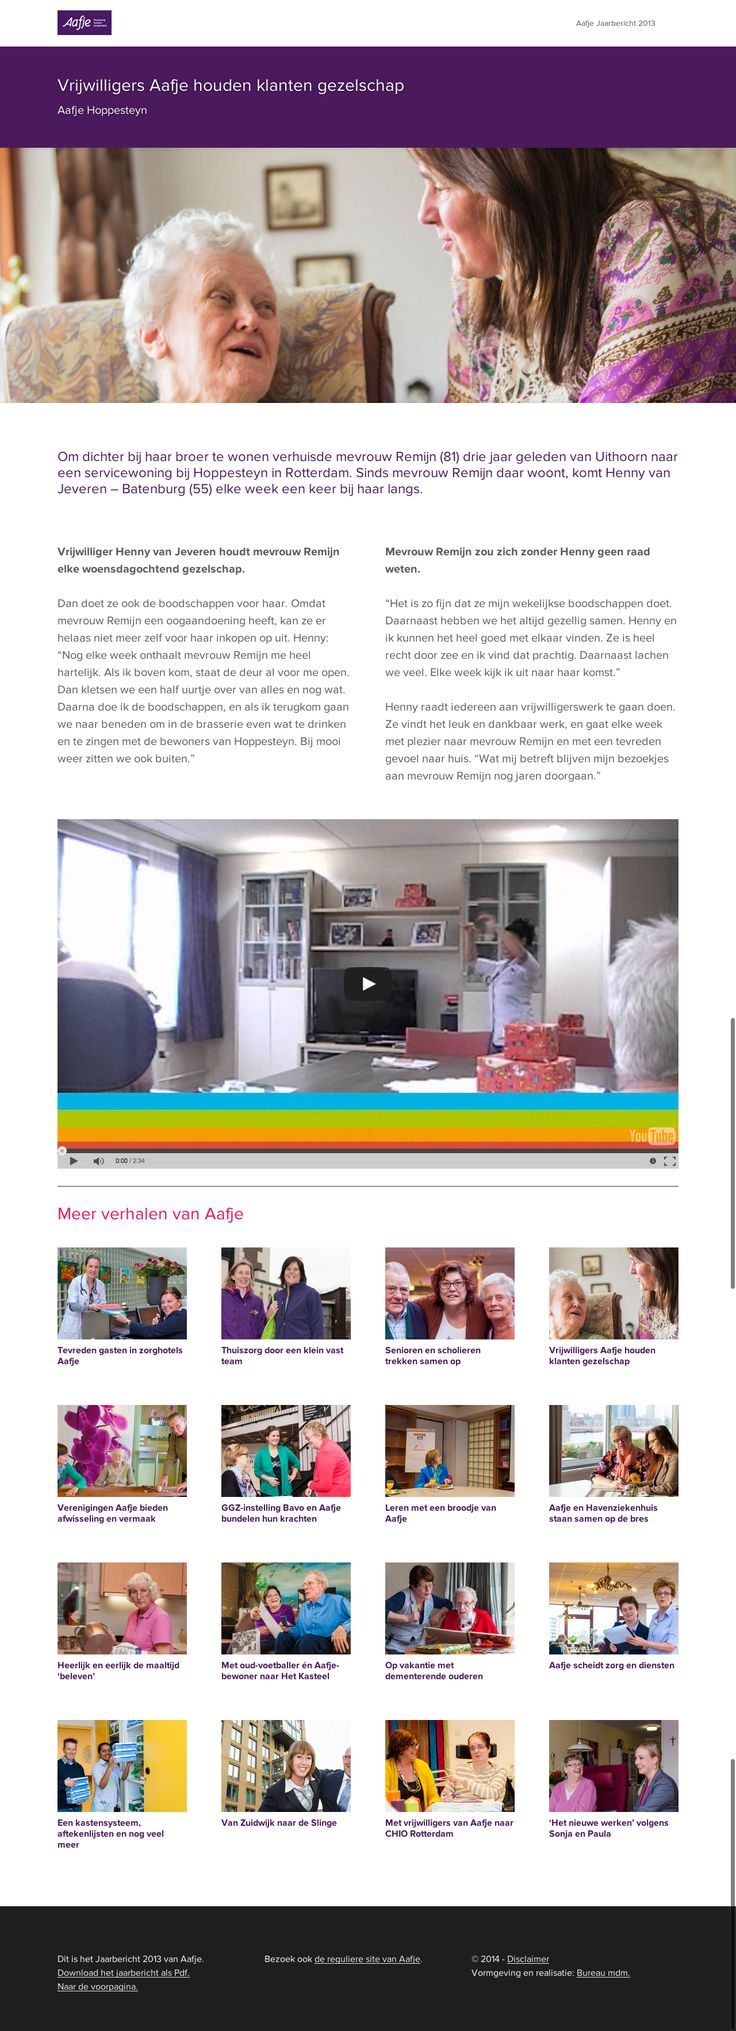 Jaarverslag-site voor Aafje.   www.aafje2013.nl